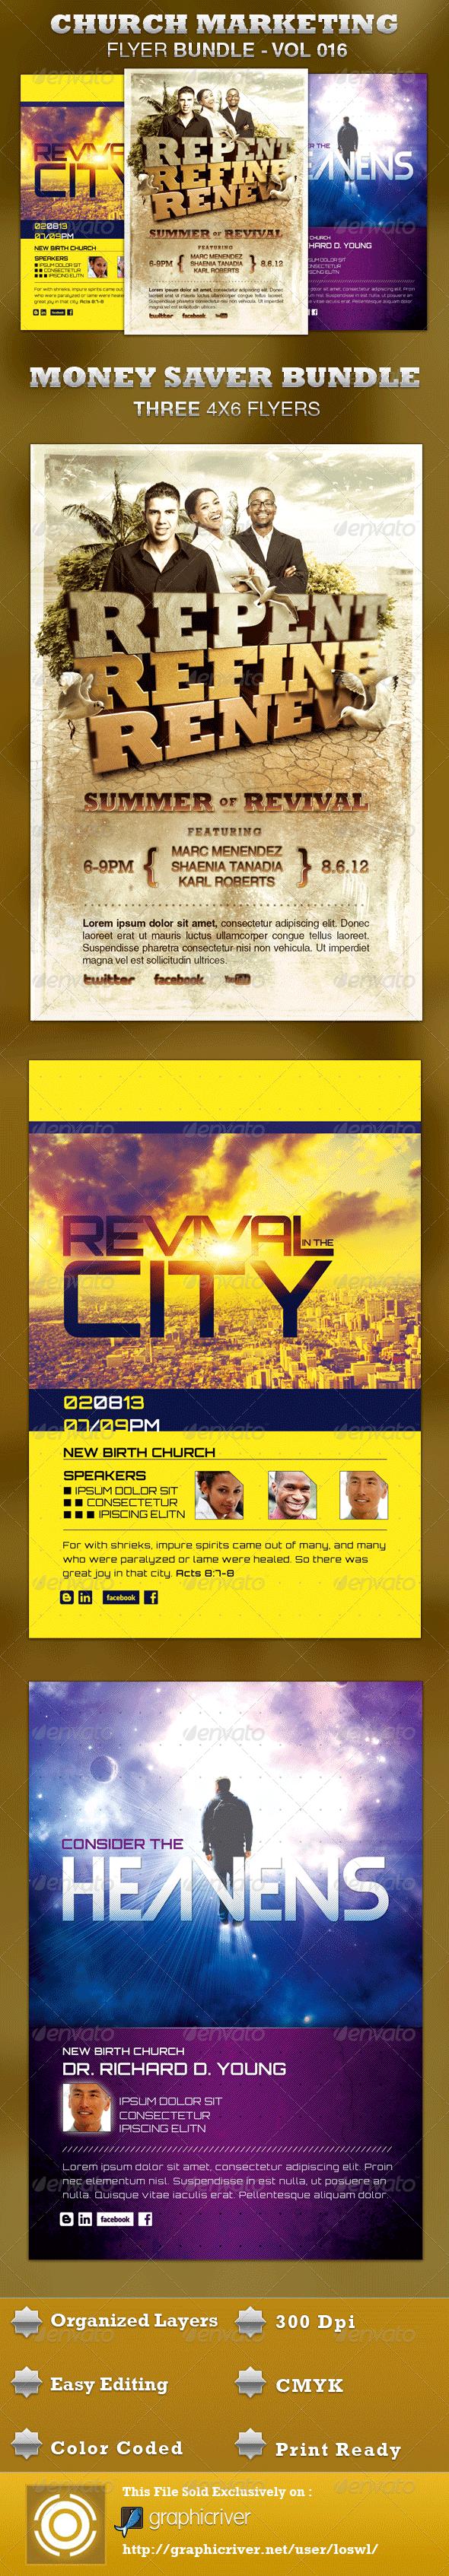 GraphicRiver Church Marketing Flyer Bundle-Vol 016 3544481